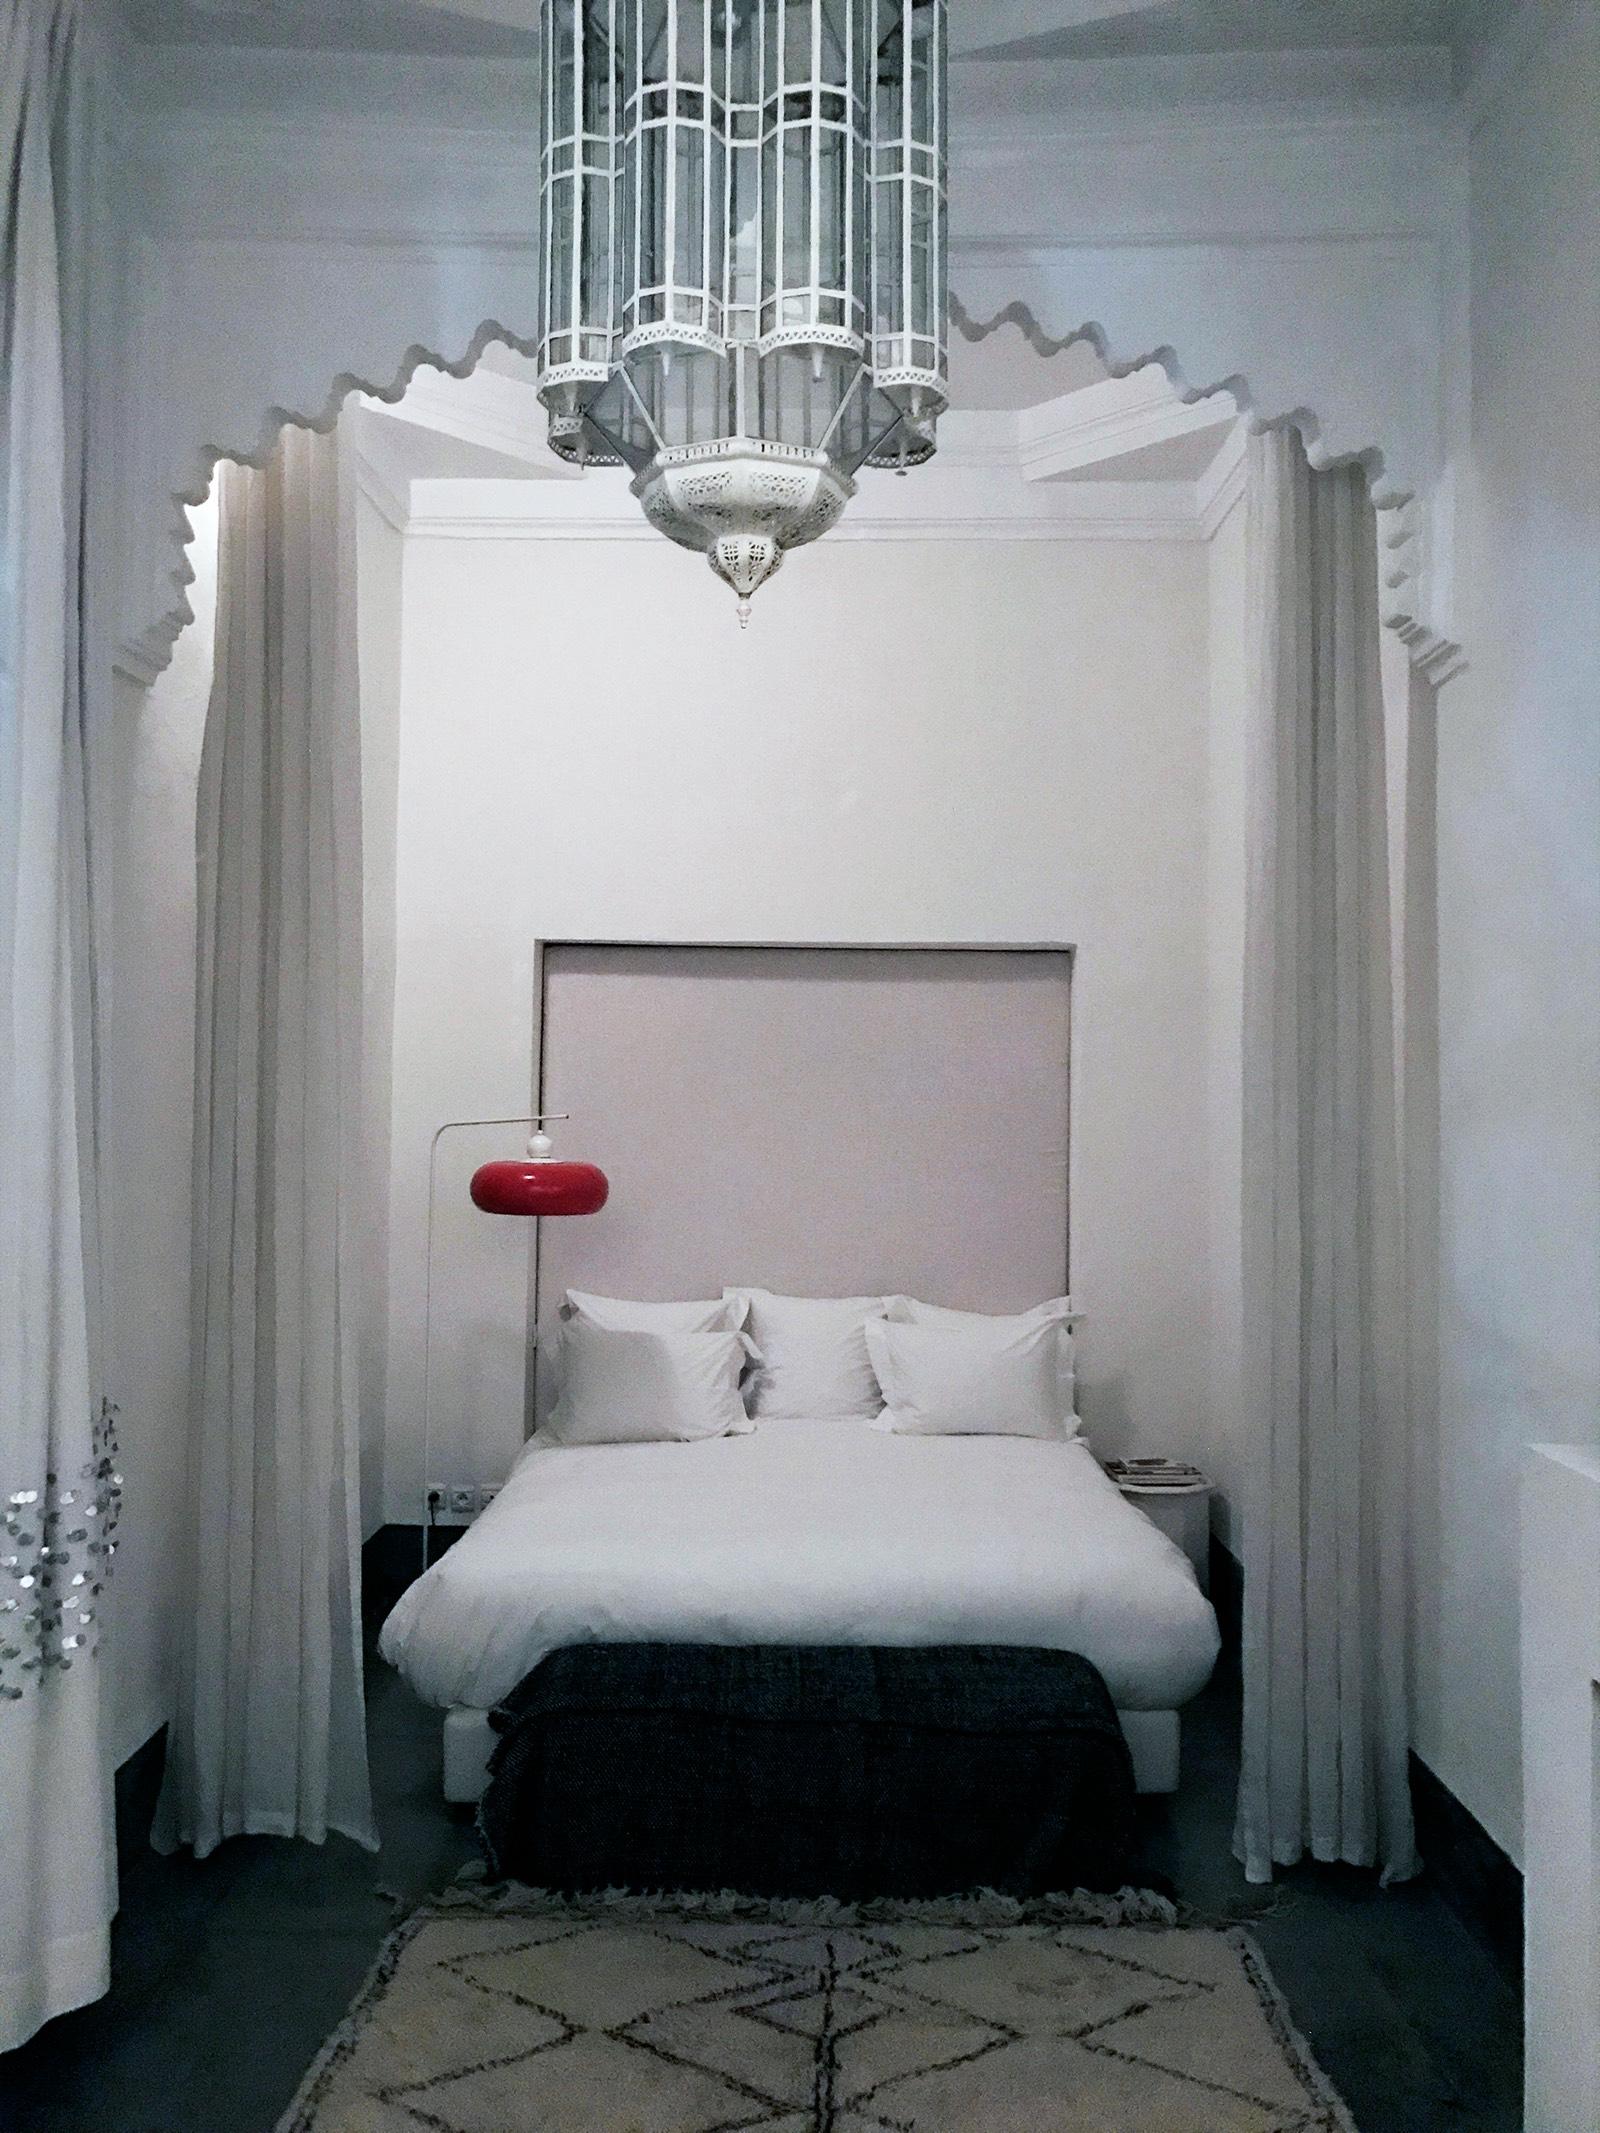 Marrakesh-Riad-Be-Mena-guest-room-bed.jpg